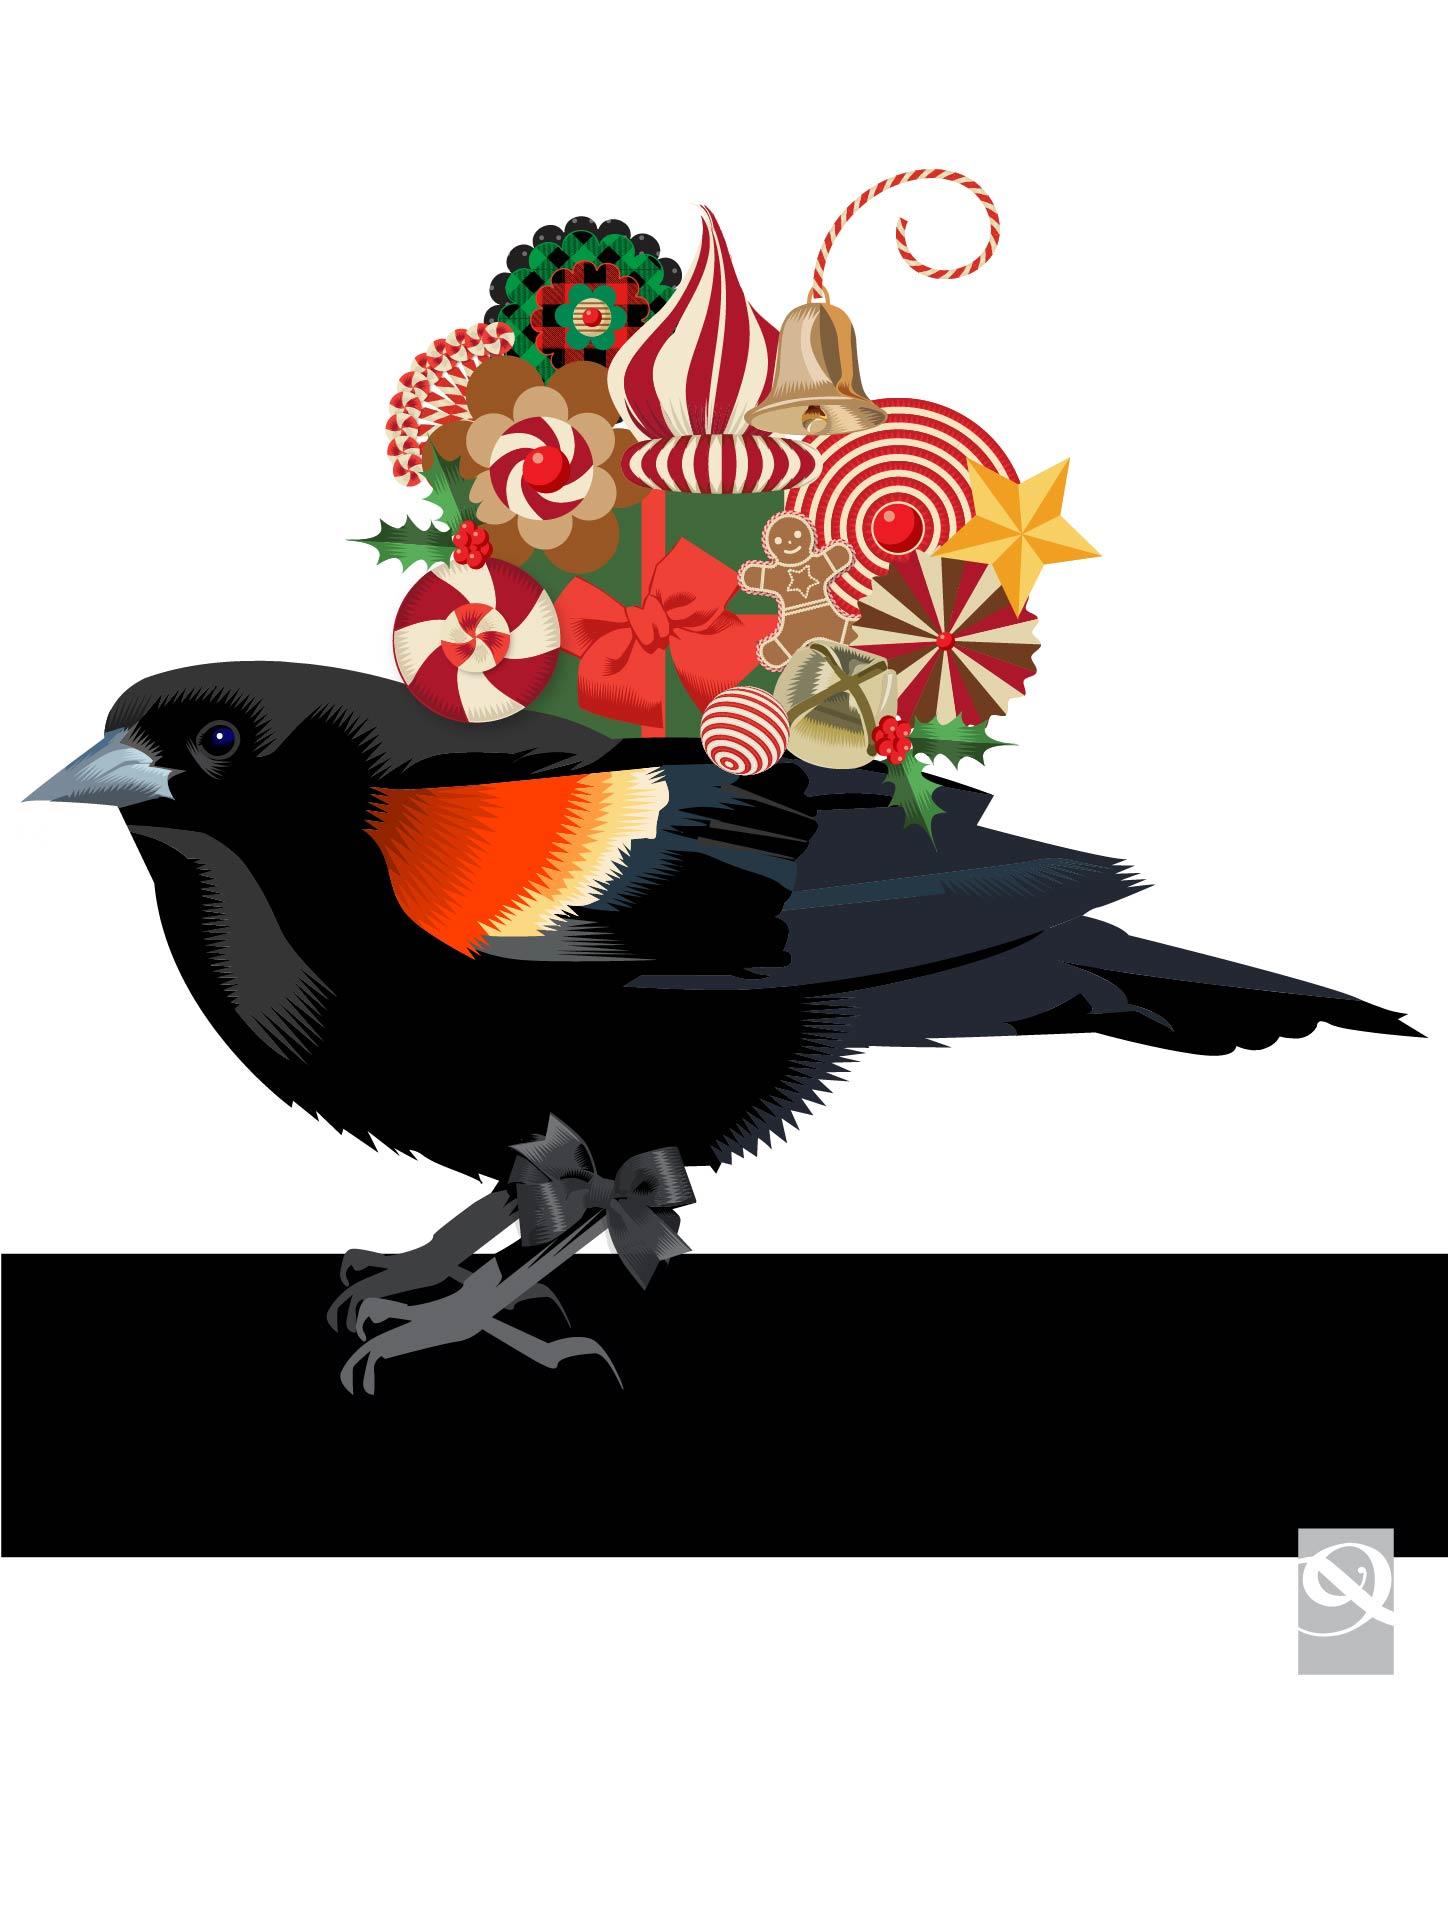 Advent 2015: Day Twenty Three Holiday Messenger   Q. Cassetti, 2015